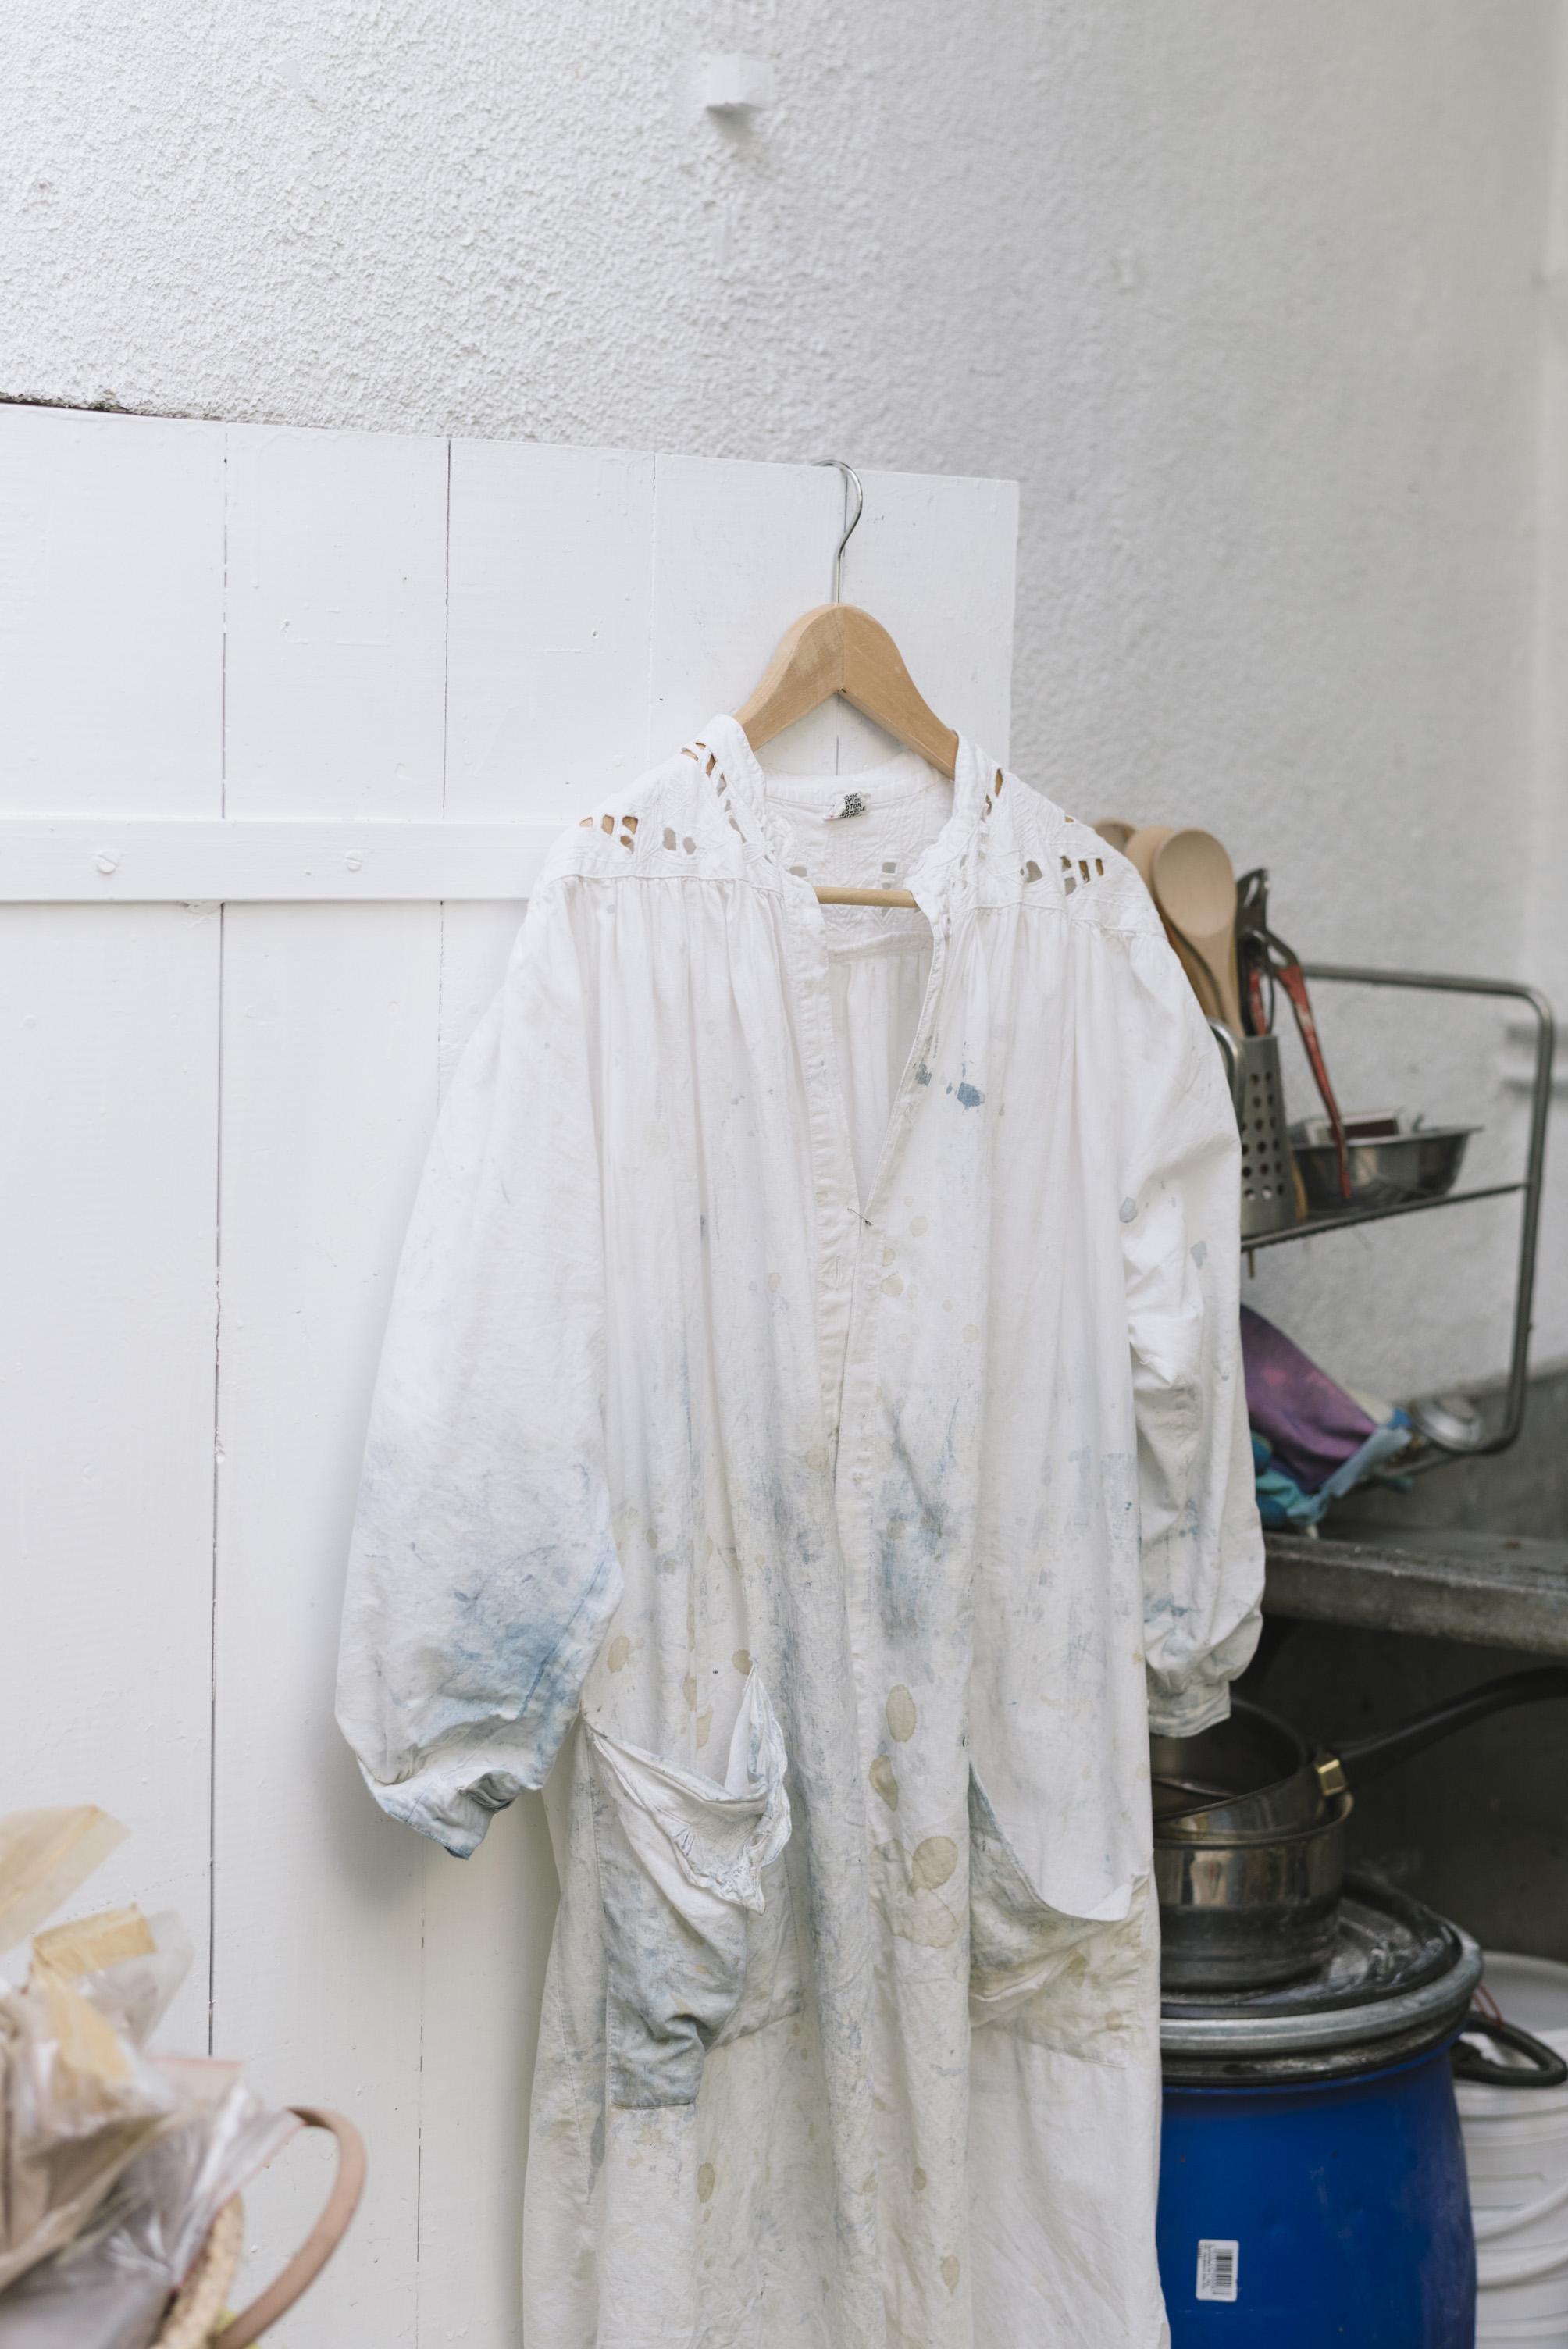 Atelier Simone - Olivia Thébaut